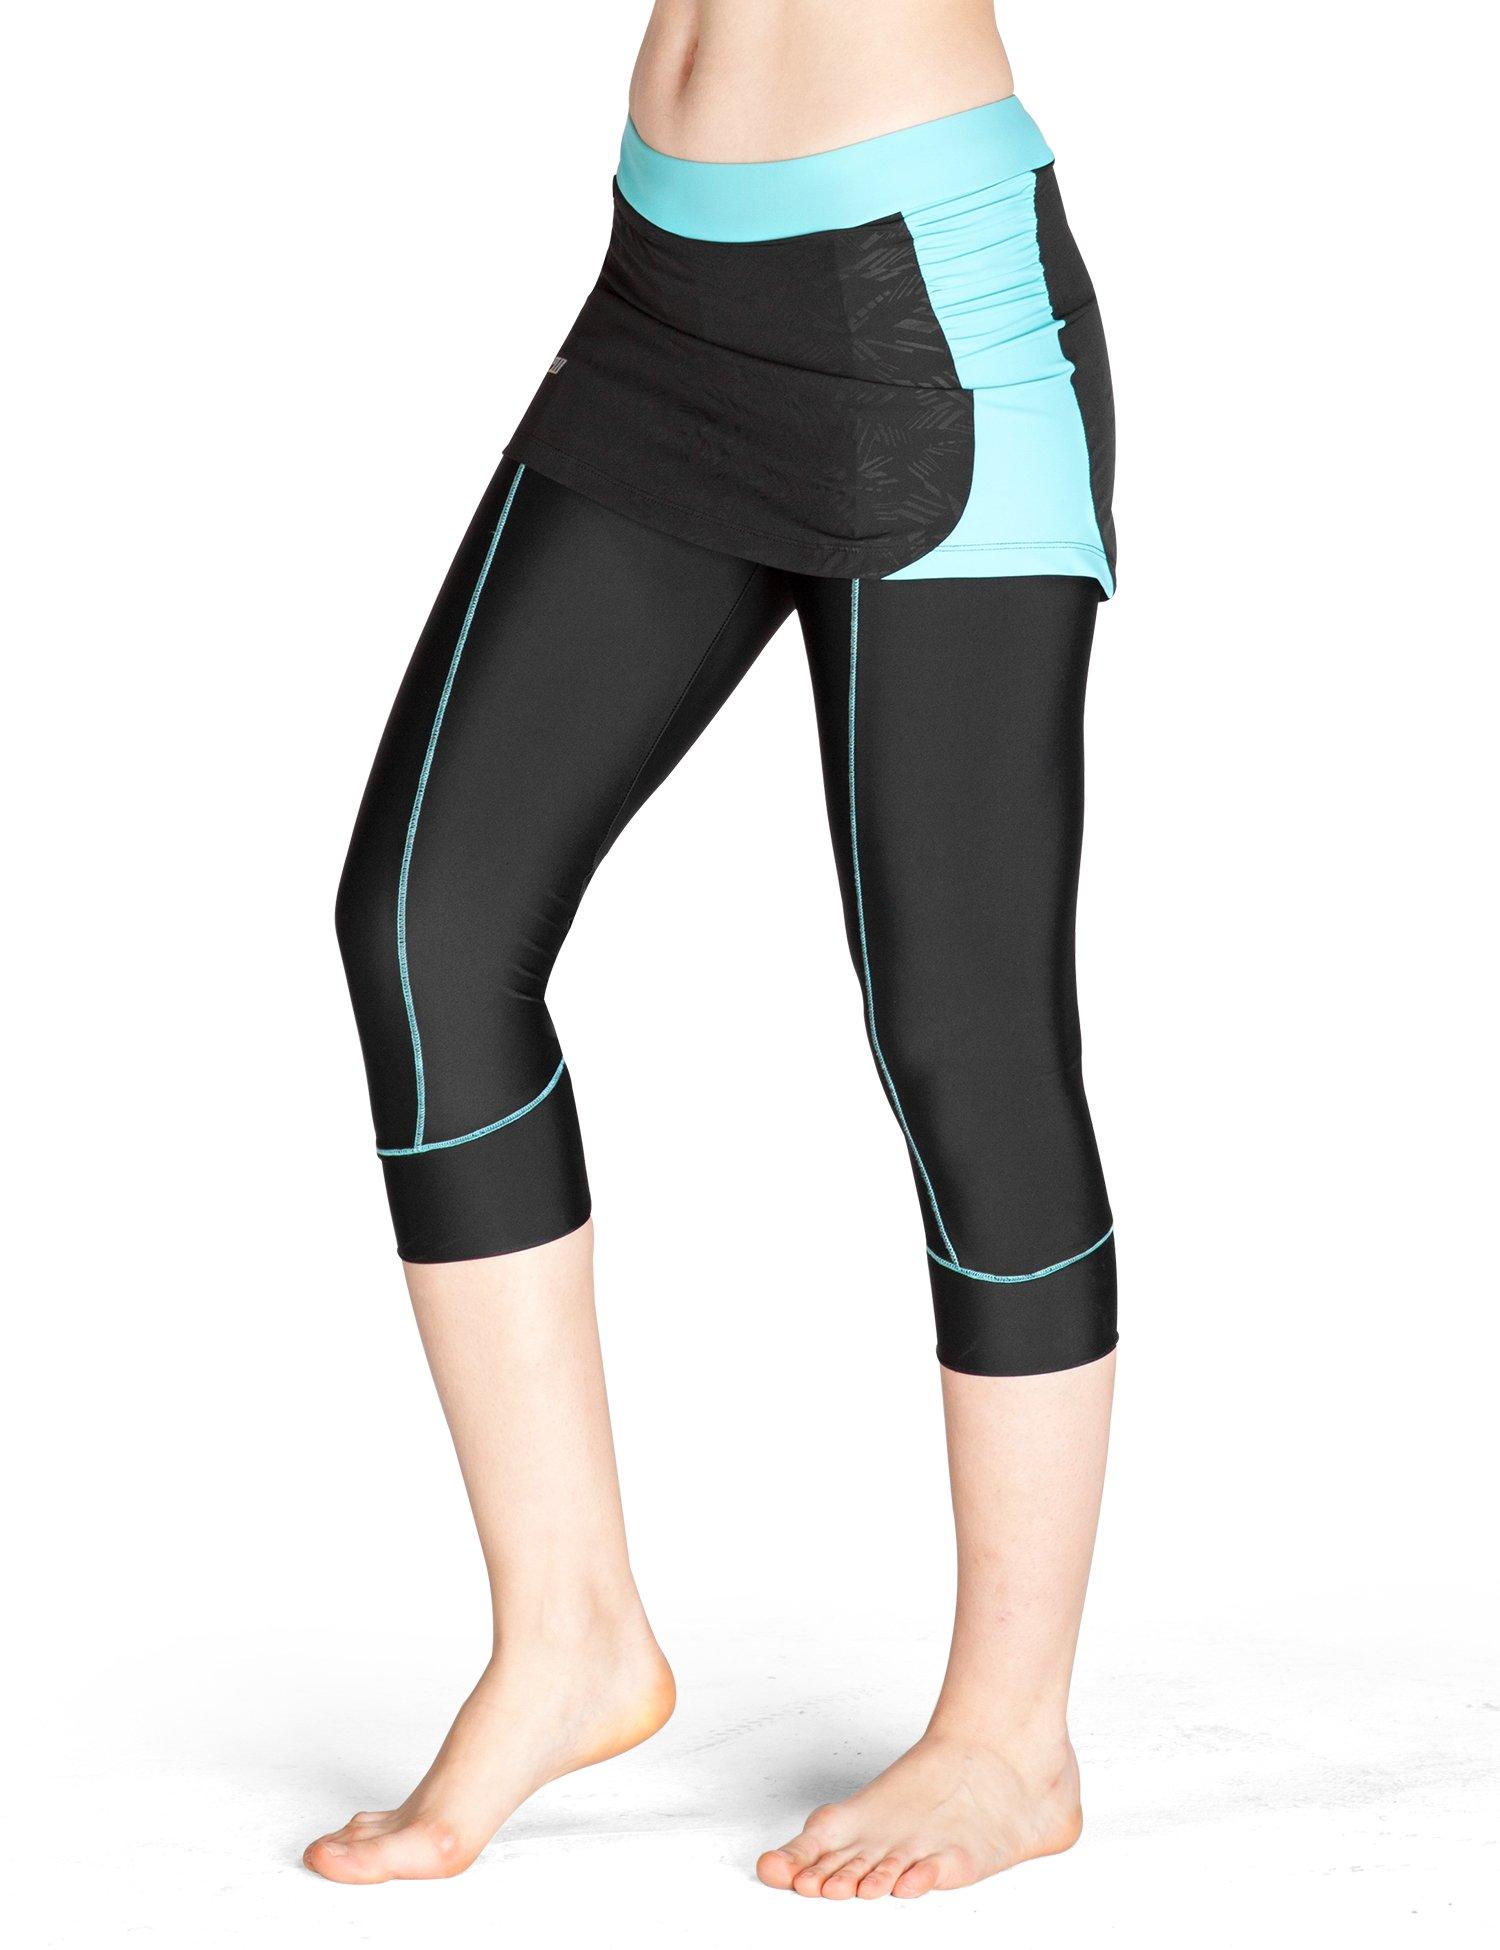 Lameda Women's Cycling Capri Pants Padded Skirted Shorts Cropped Leggings for Running Biking Green Large